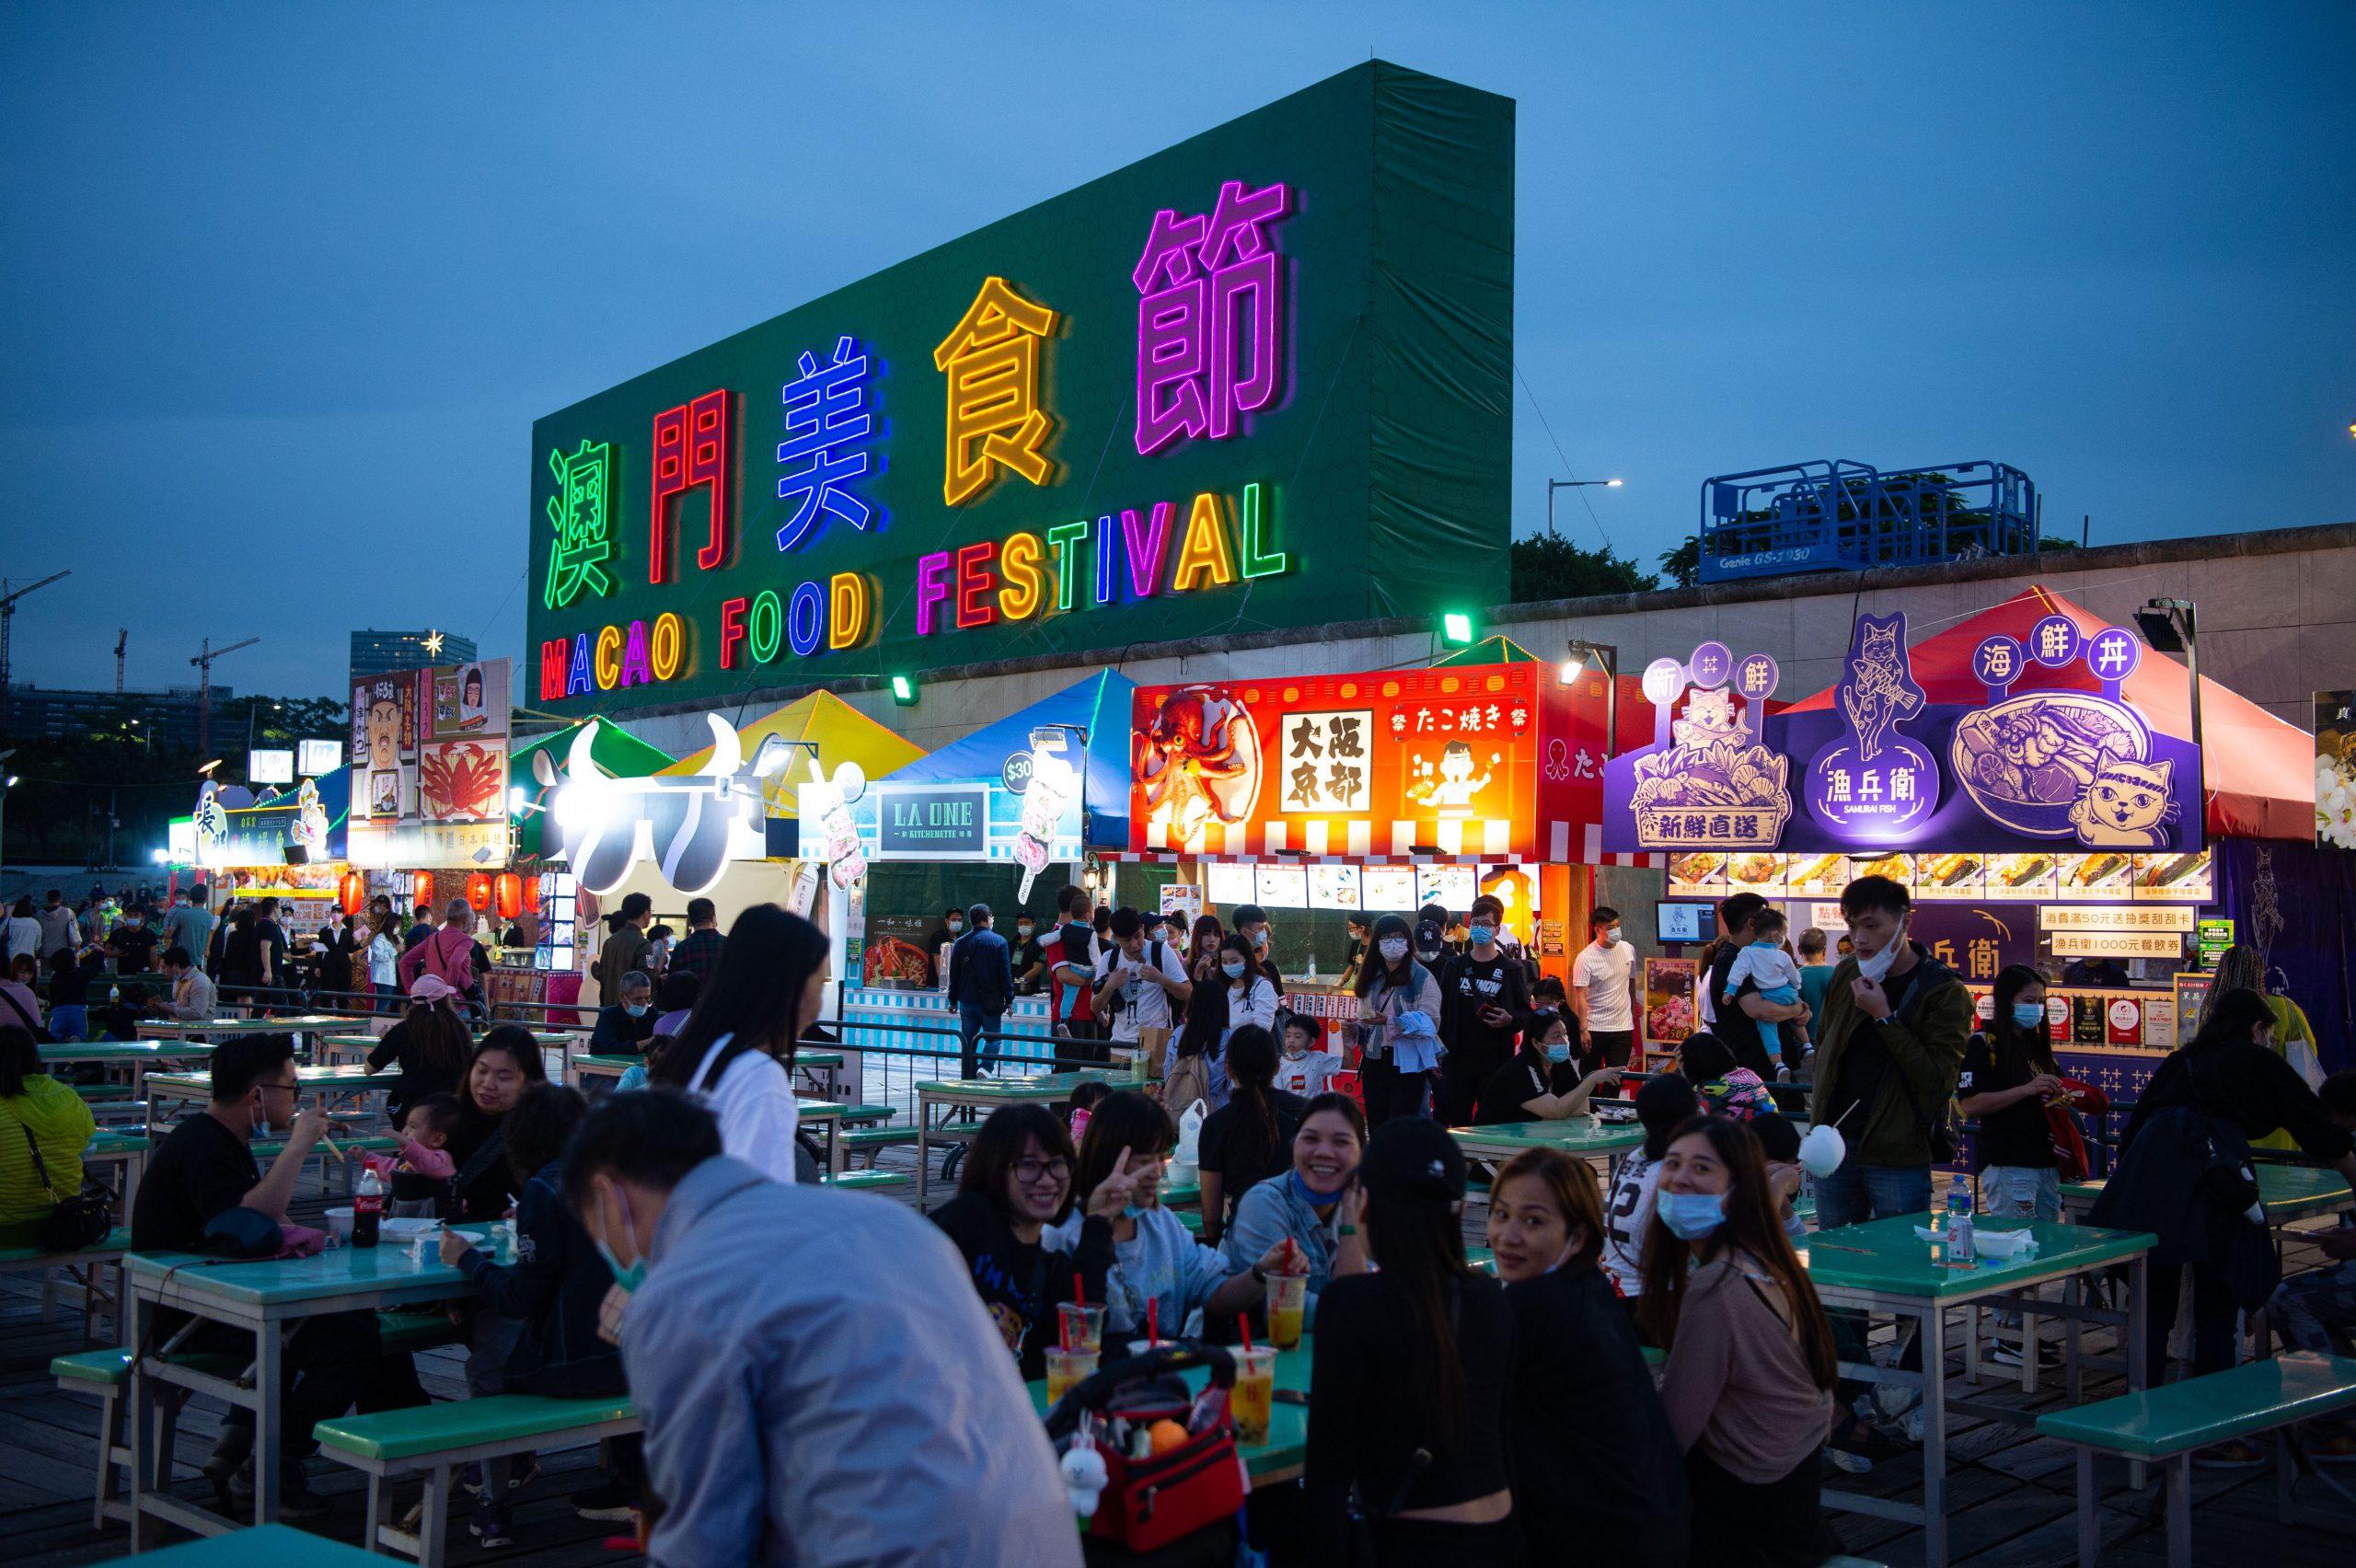 CHINA-MACAO-FOOD FESTIVAL (CN)